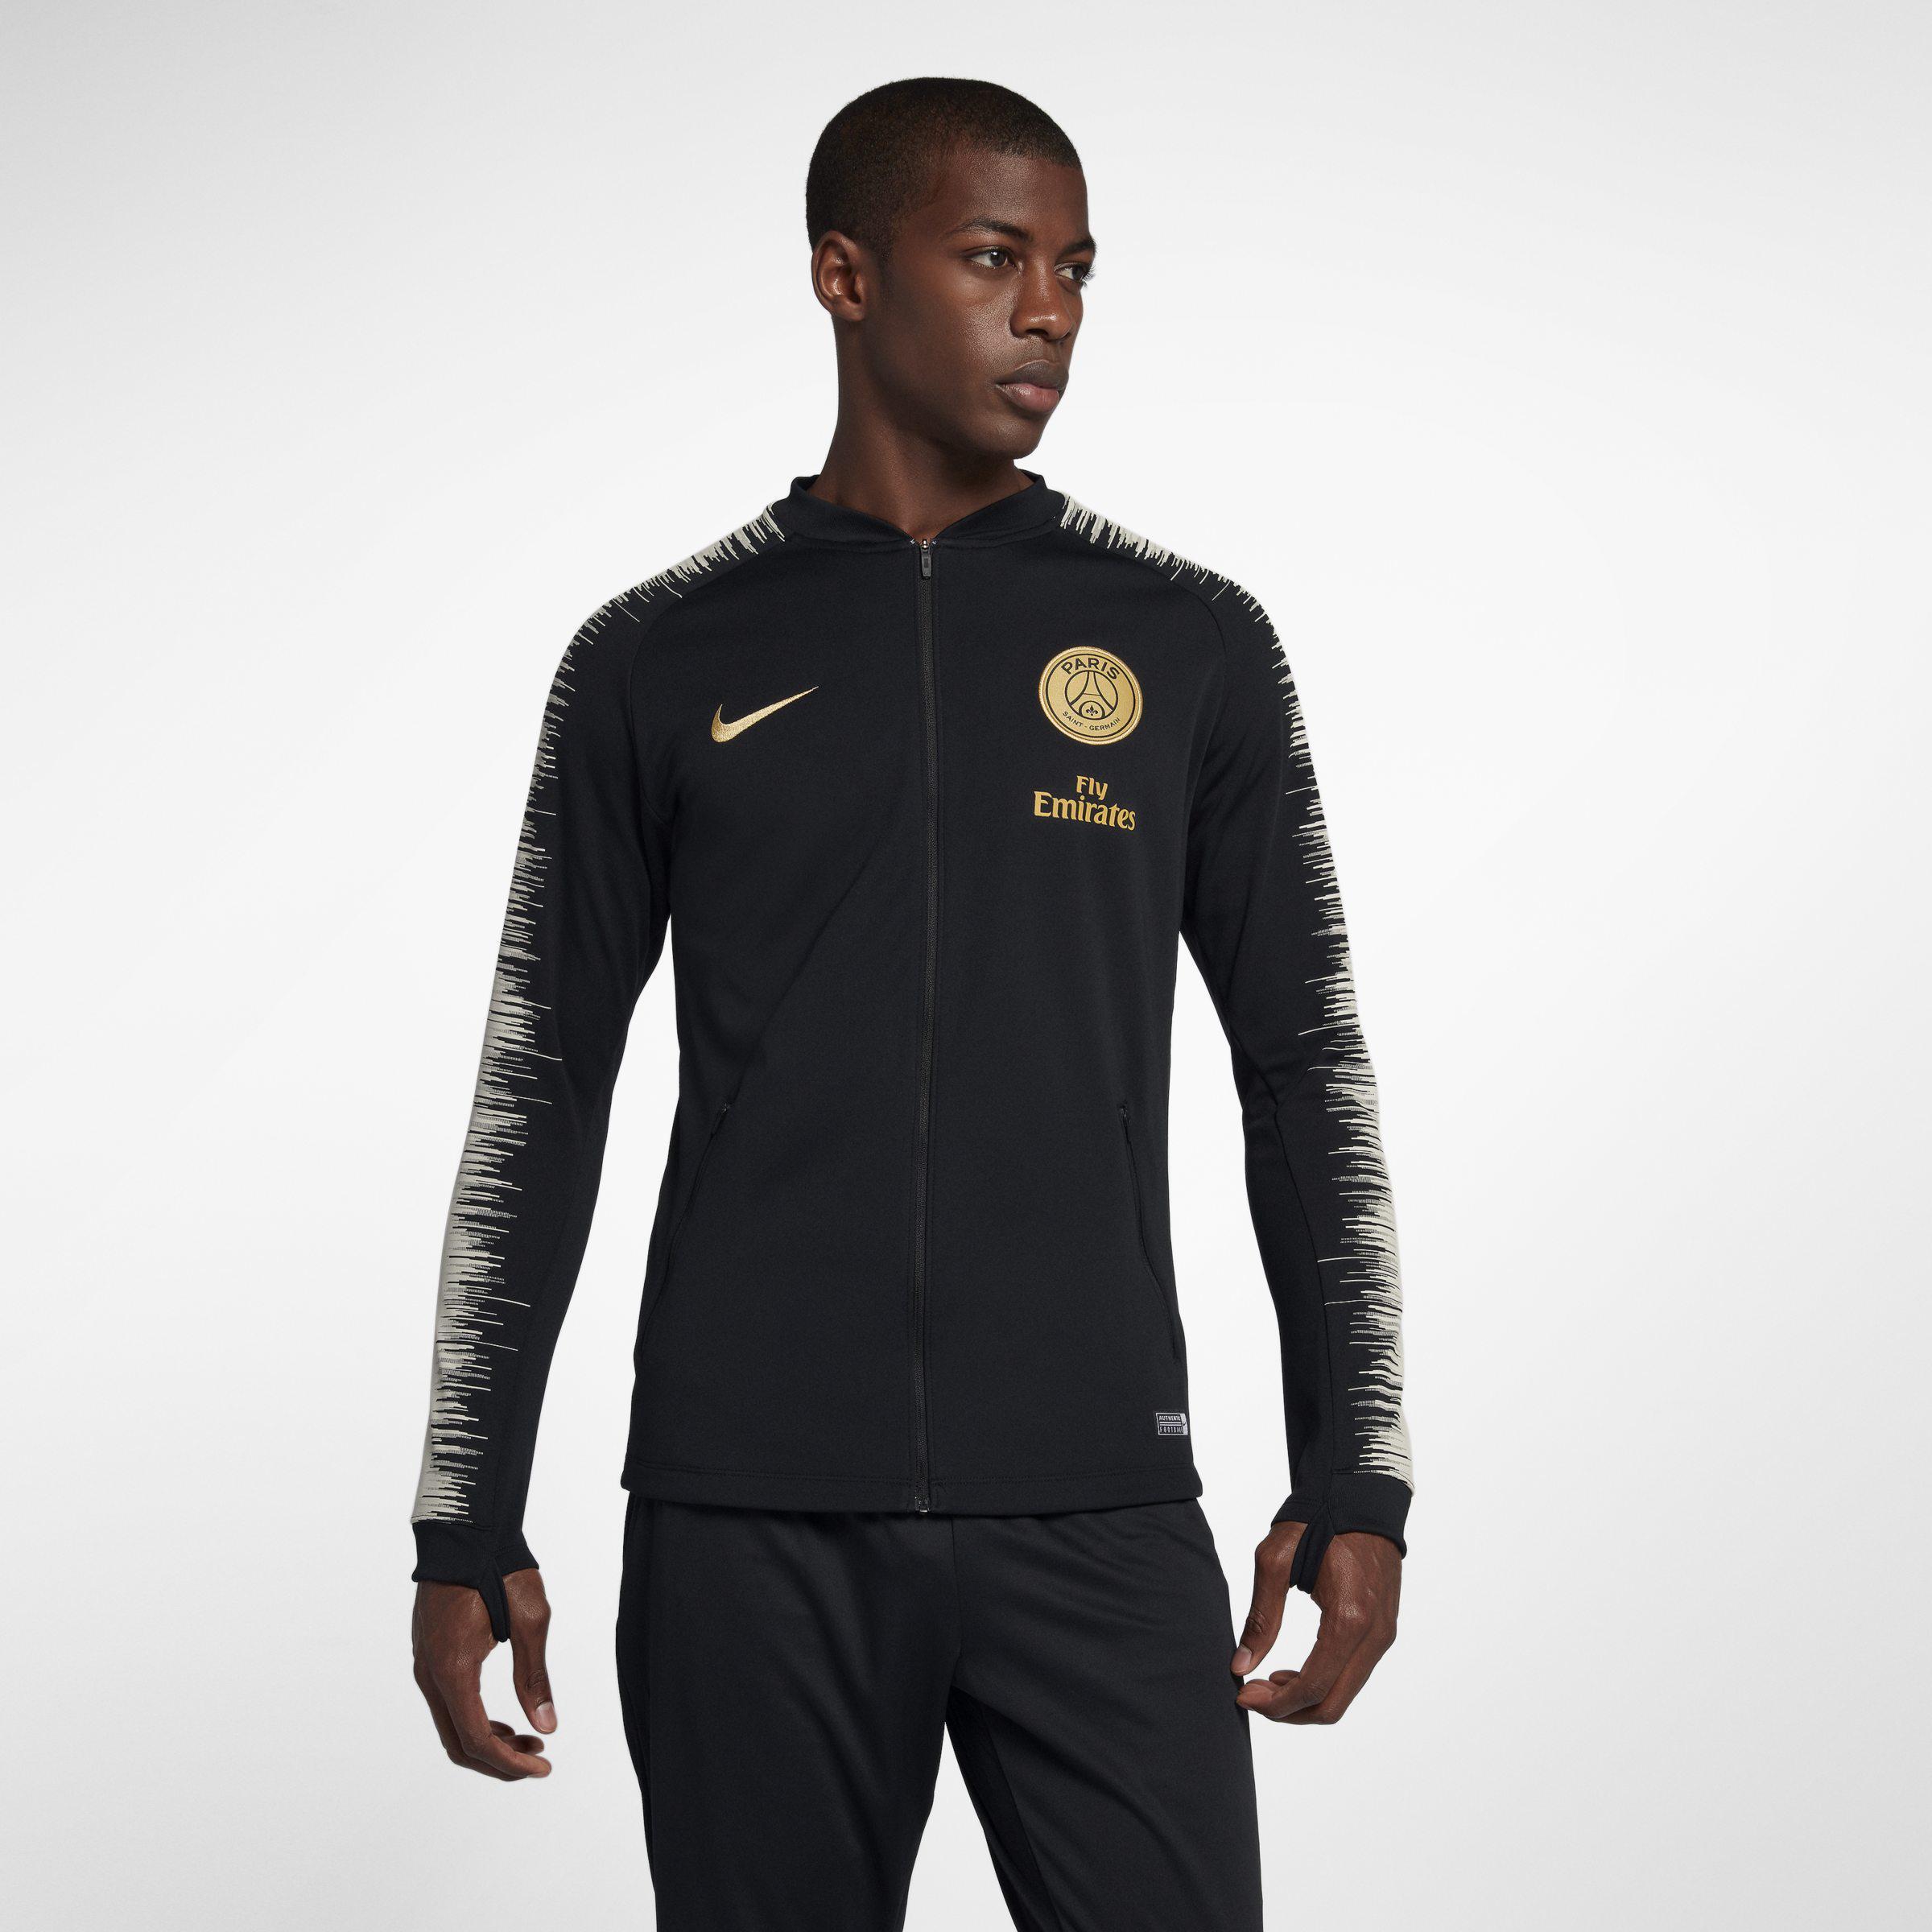 c93929425 Nike Paris Saint-germain Anthem Football Jacket in Black for Men - Lyst